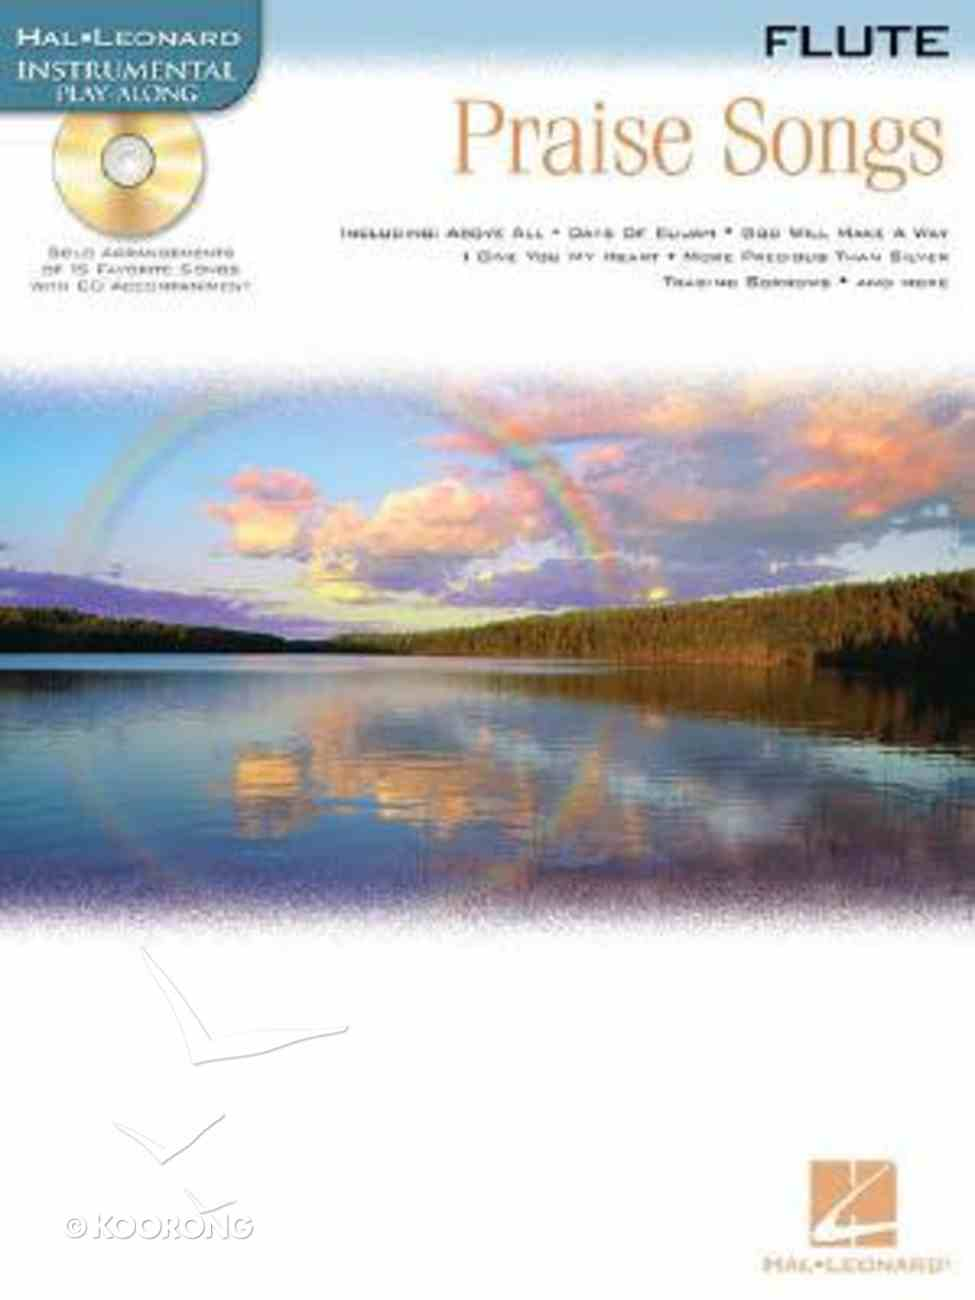 Praise Songs: Instrumental Play-Along Pack For Flute Paperback